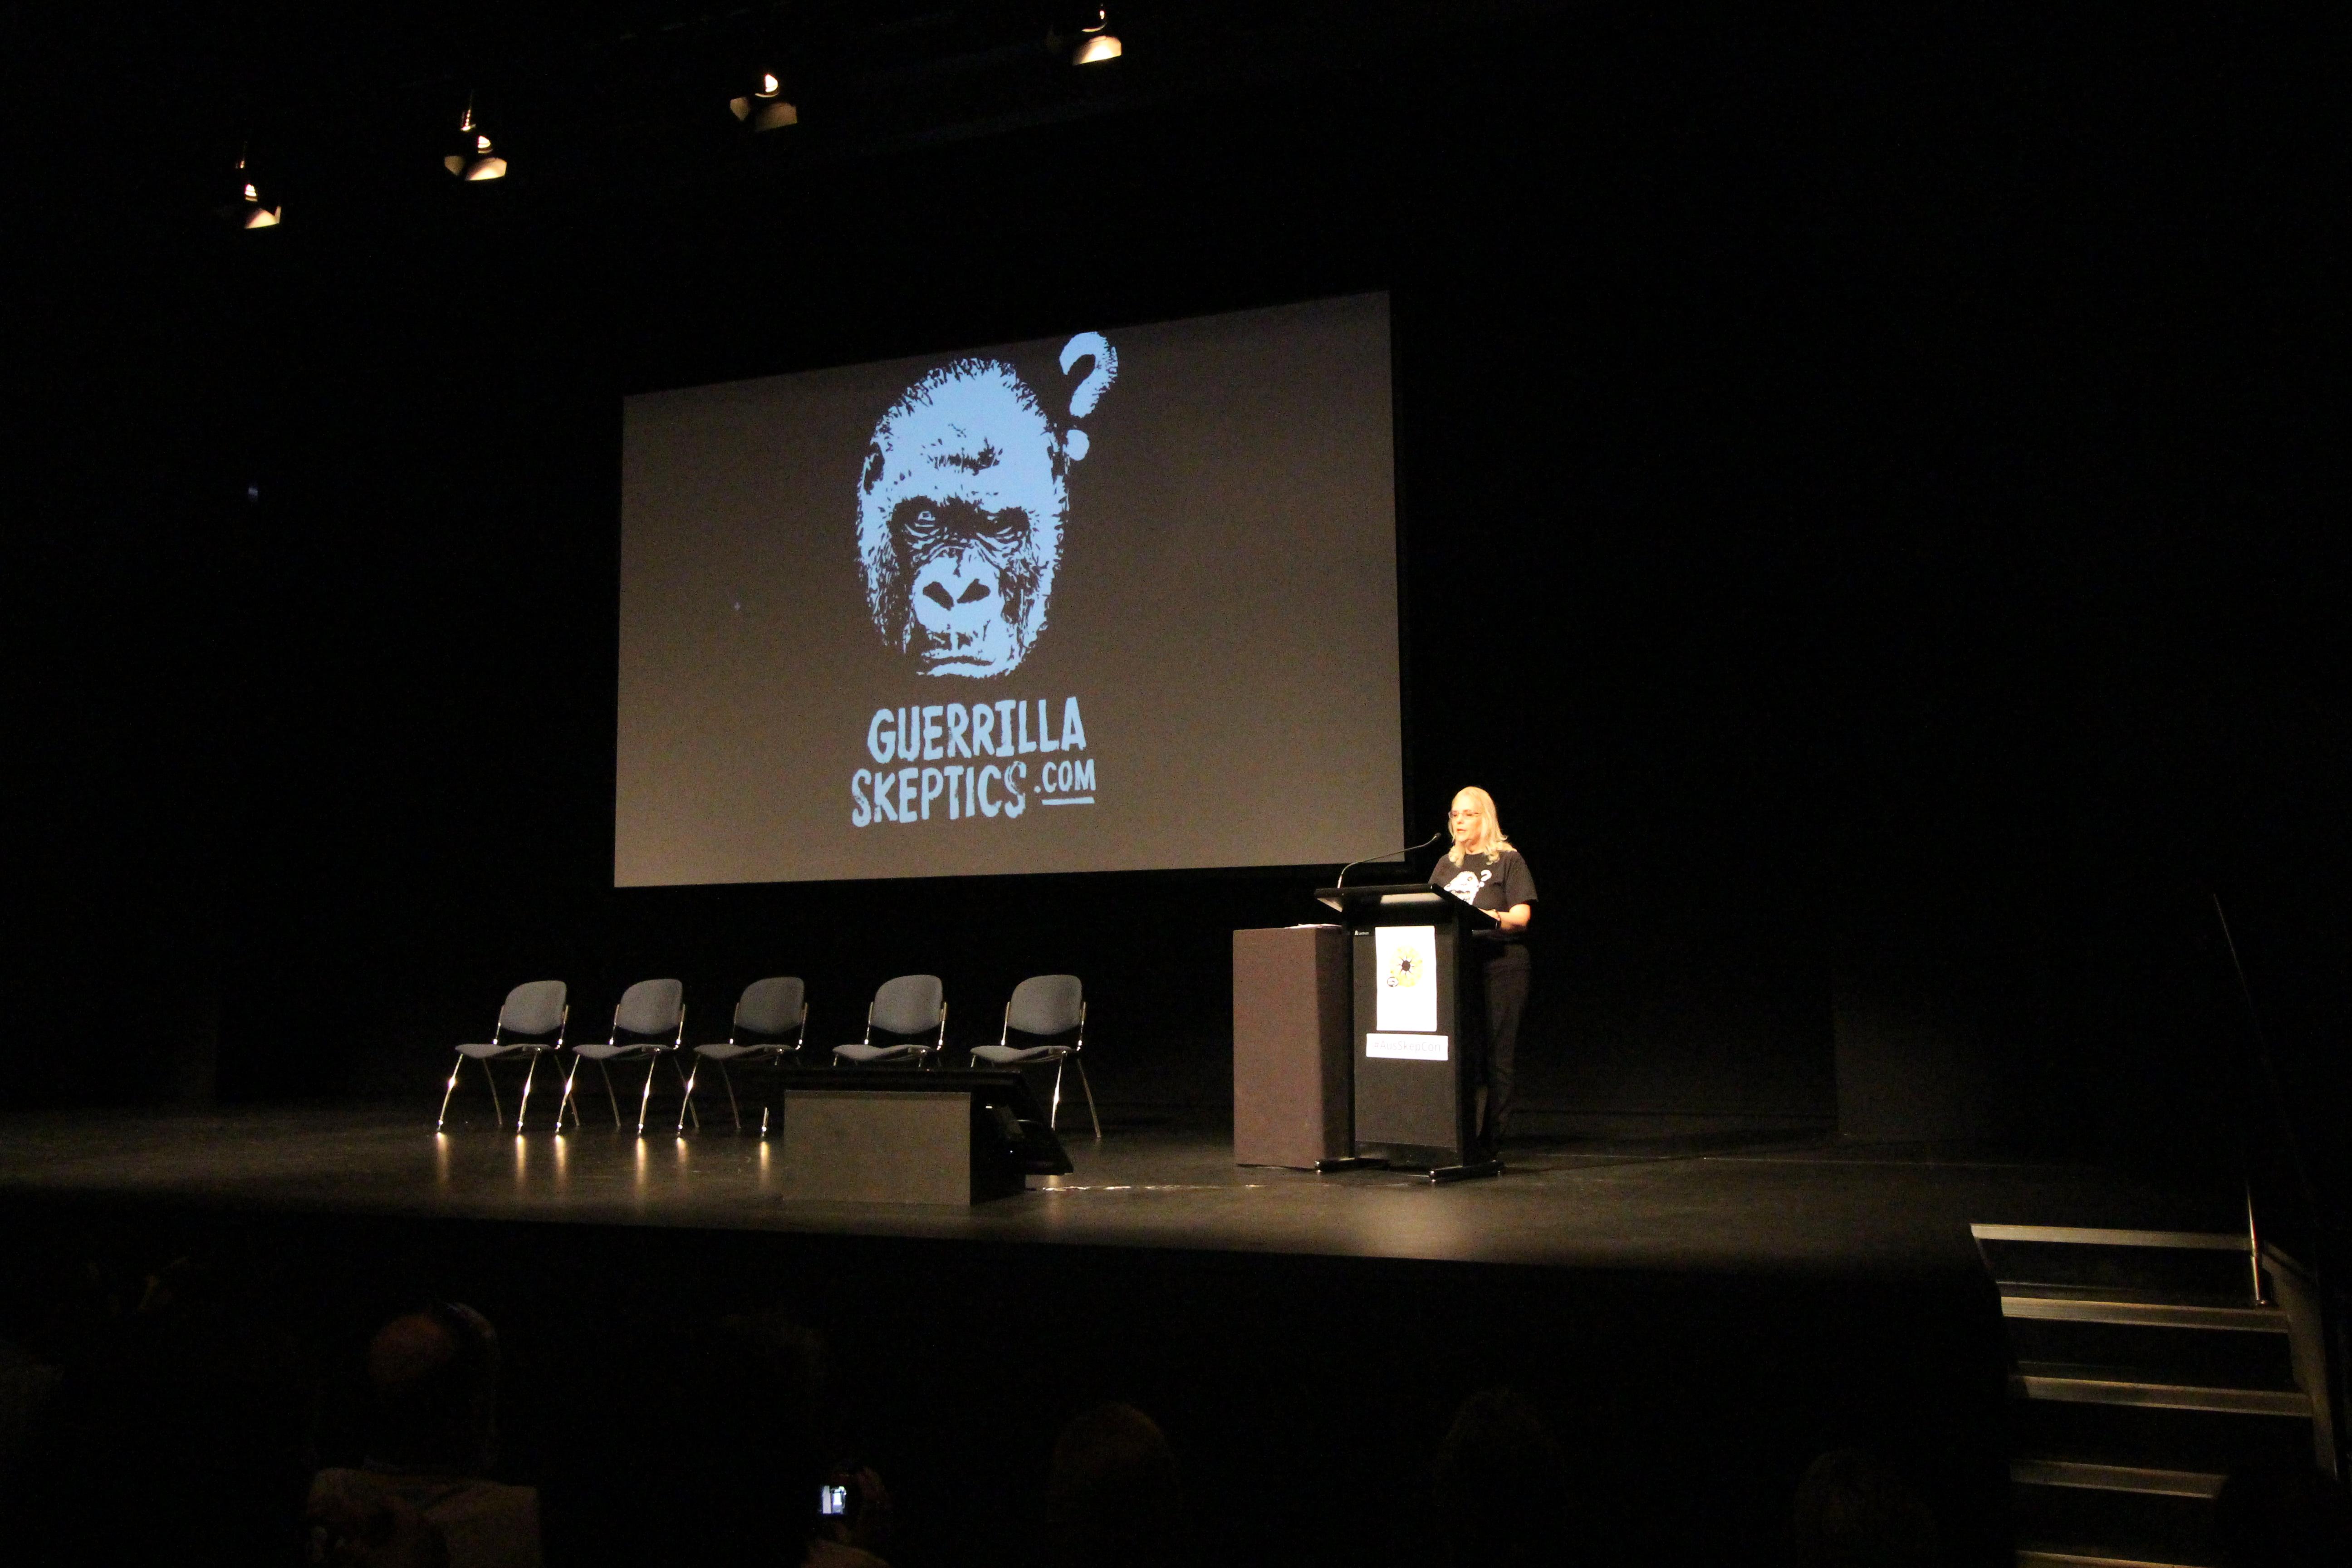 Brisbane Skeptics 201522